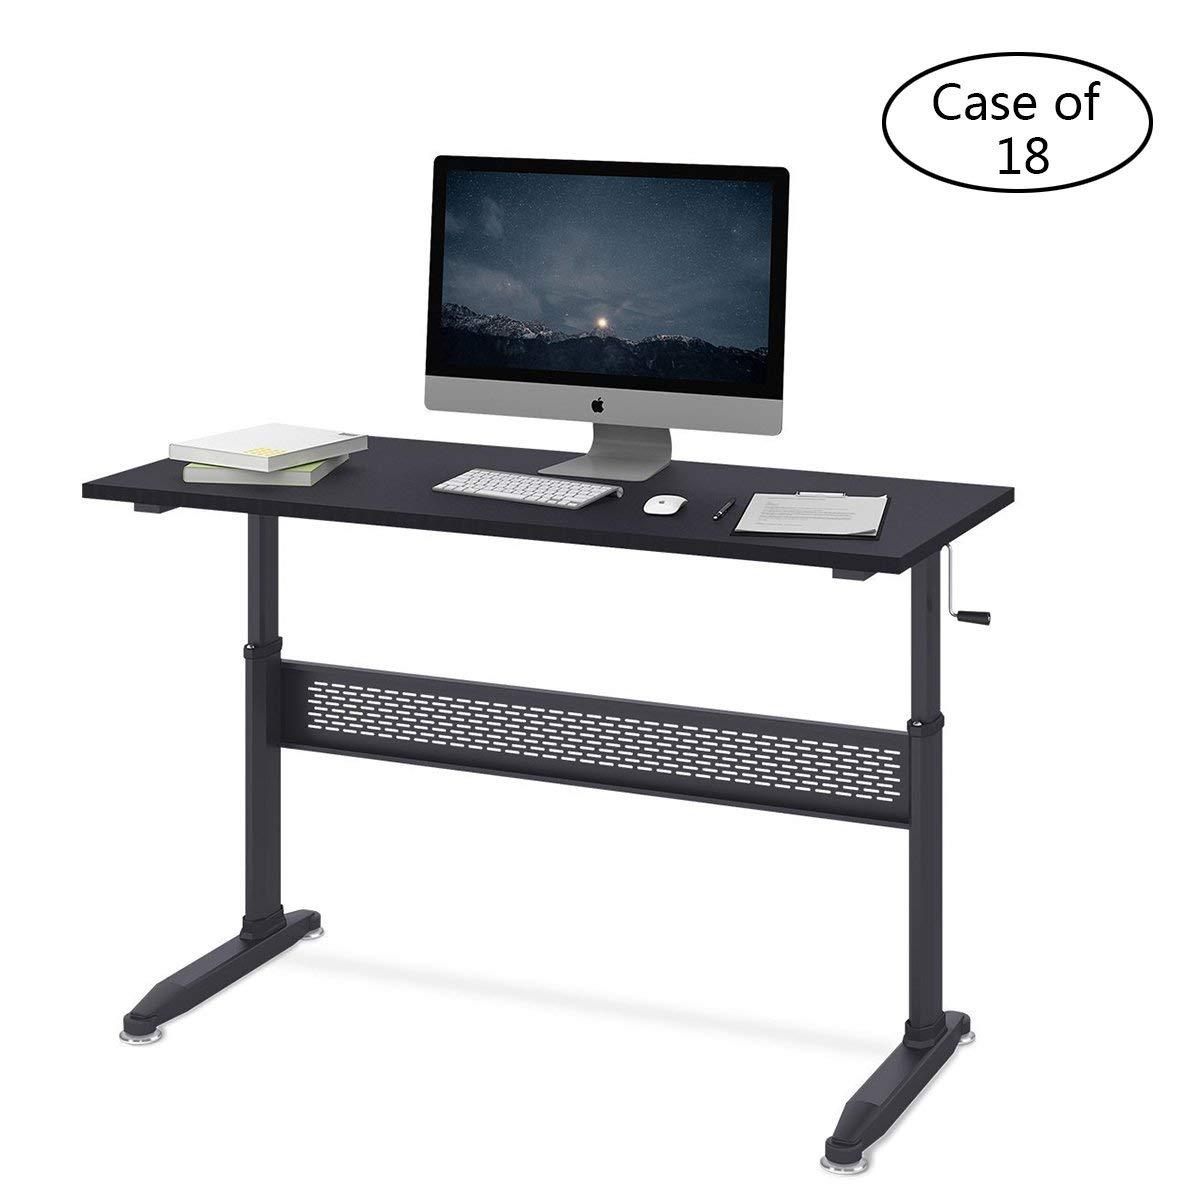 Cheap Handle Crank Adjustable Desk, find Handle Crank